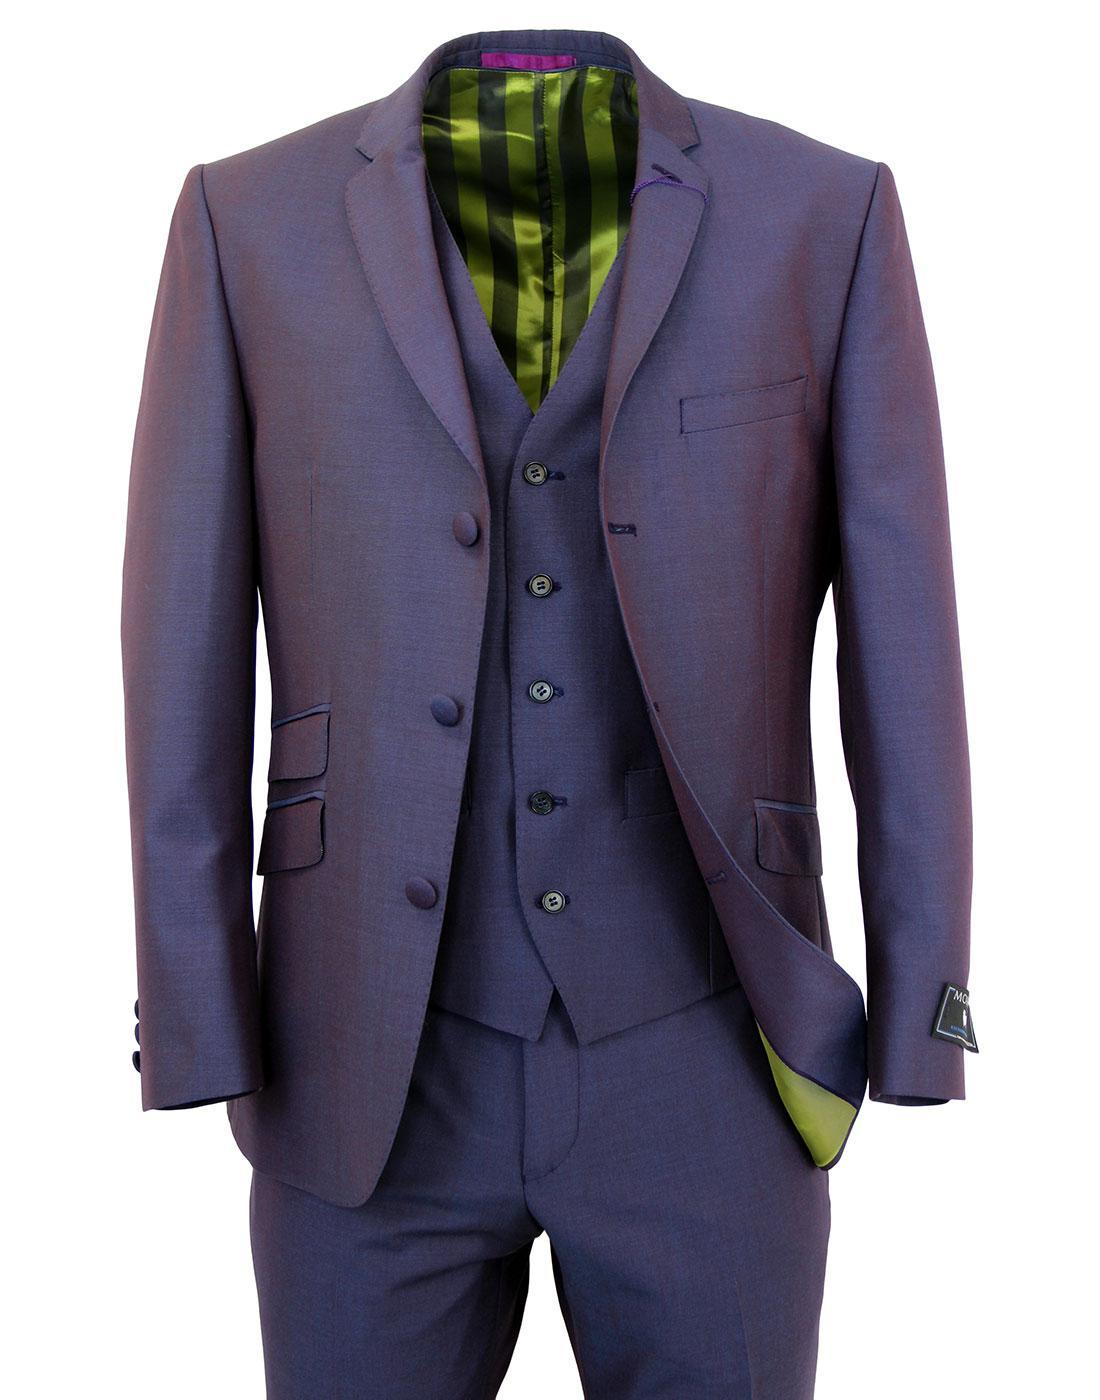 Madcap England Mod 3 Btn Mohair Tonic Suit Jacket